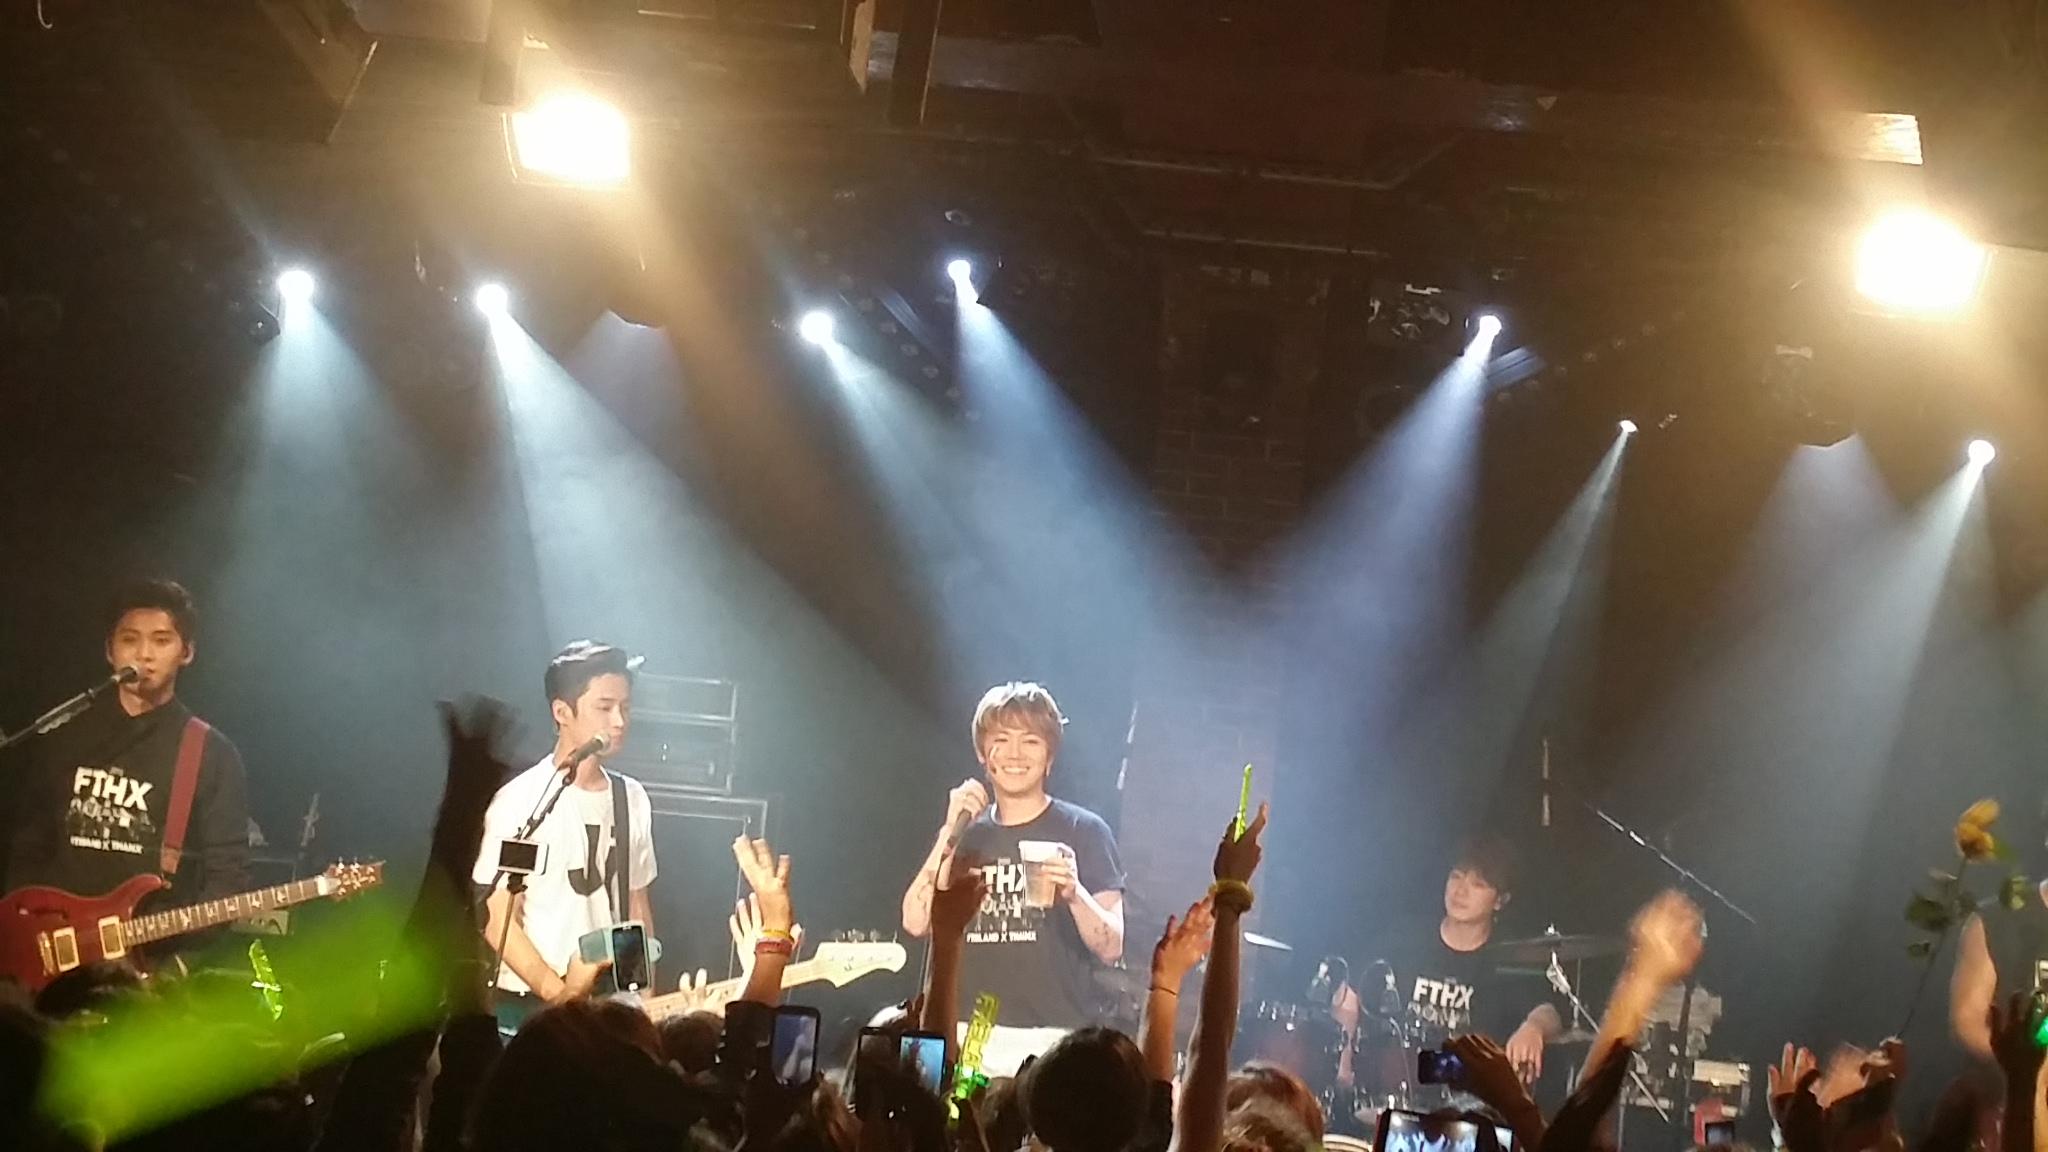 Honggi végig sörözte a koncertet